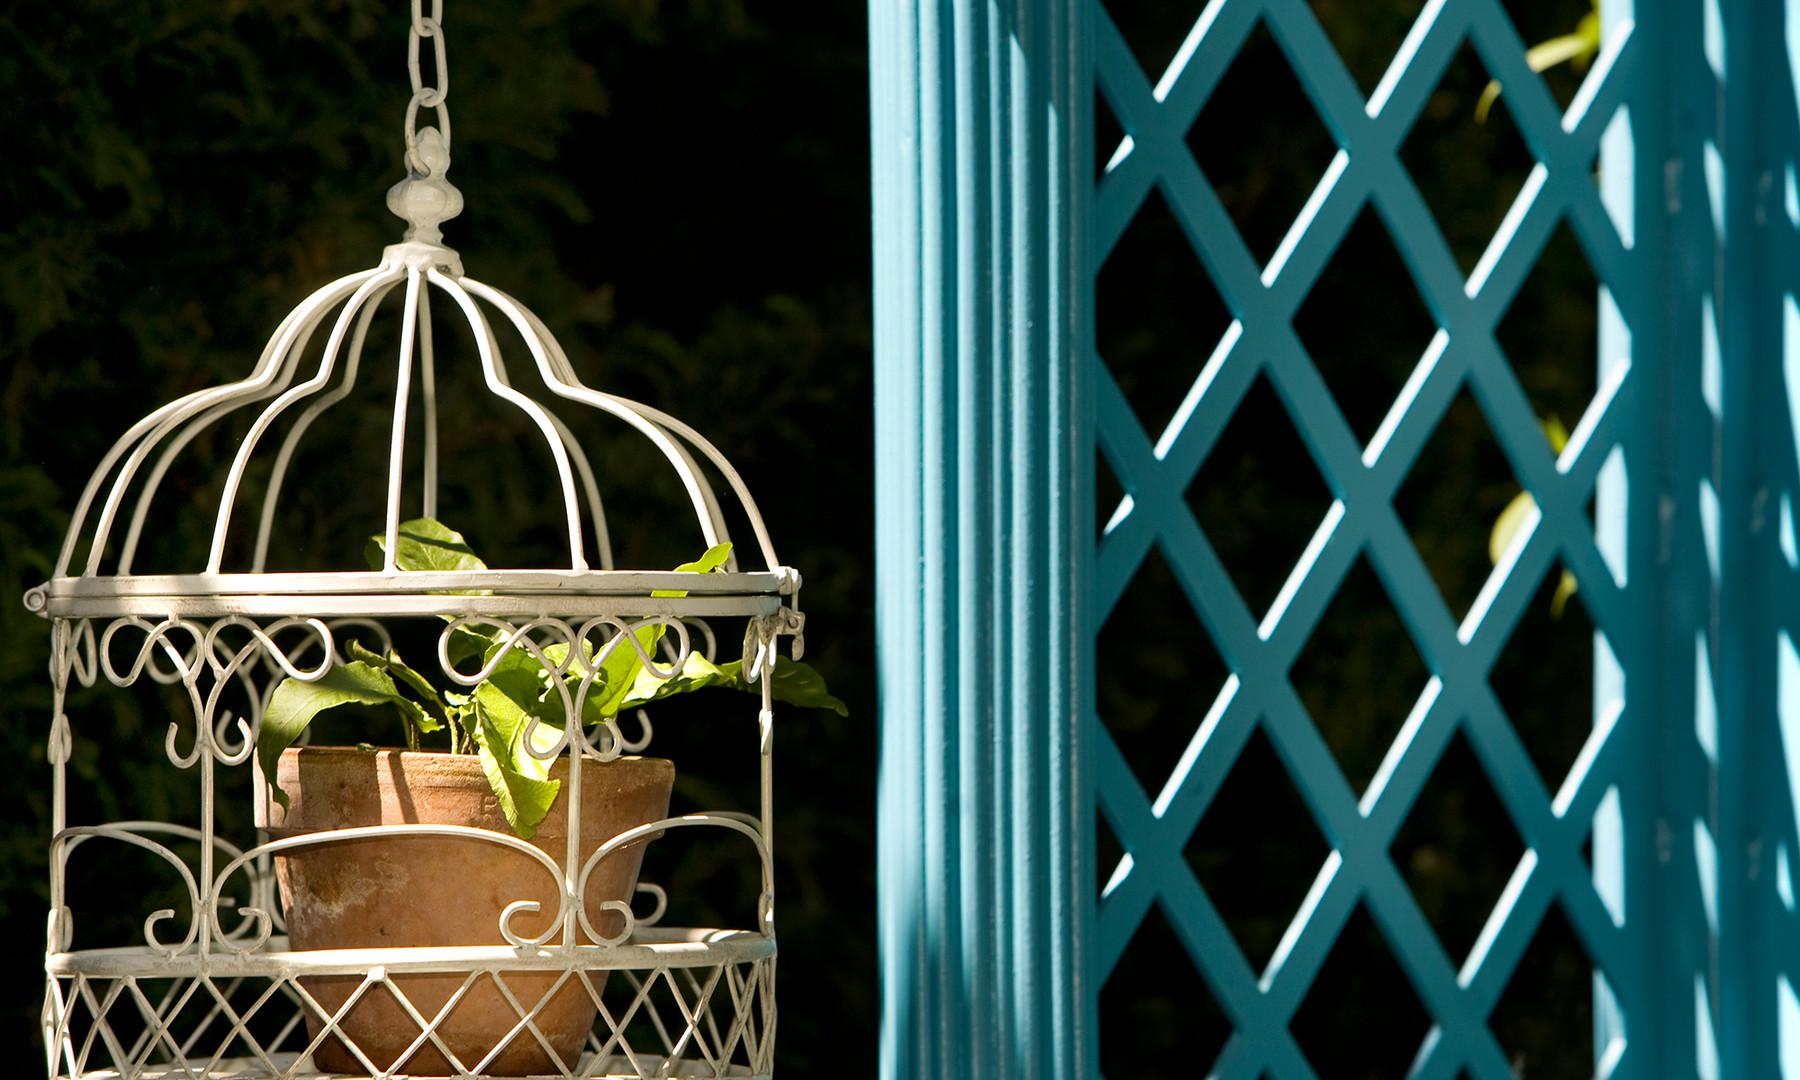 Victorian Aviary Garden detail